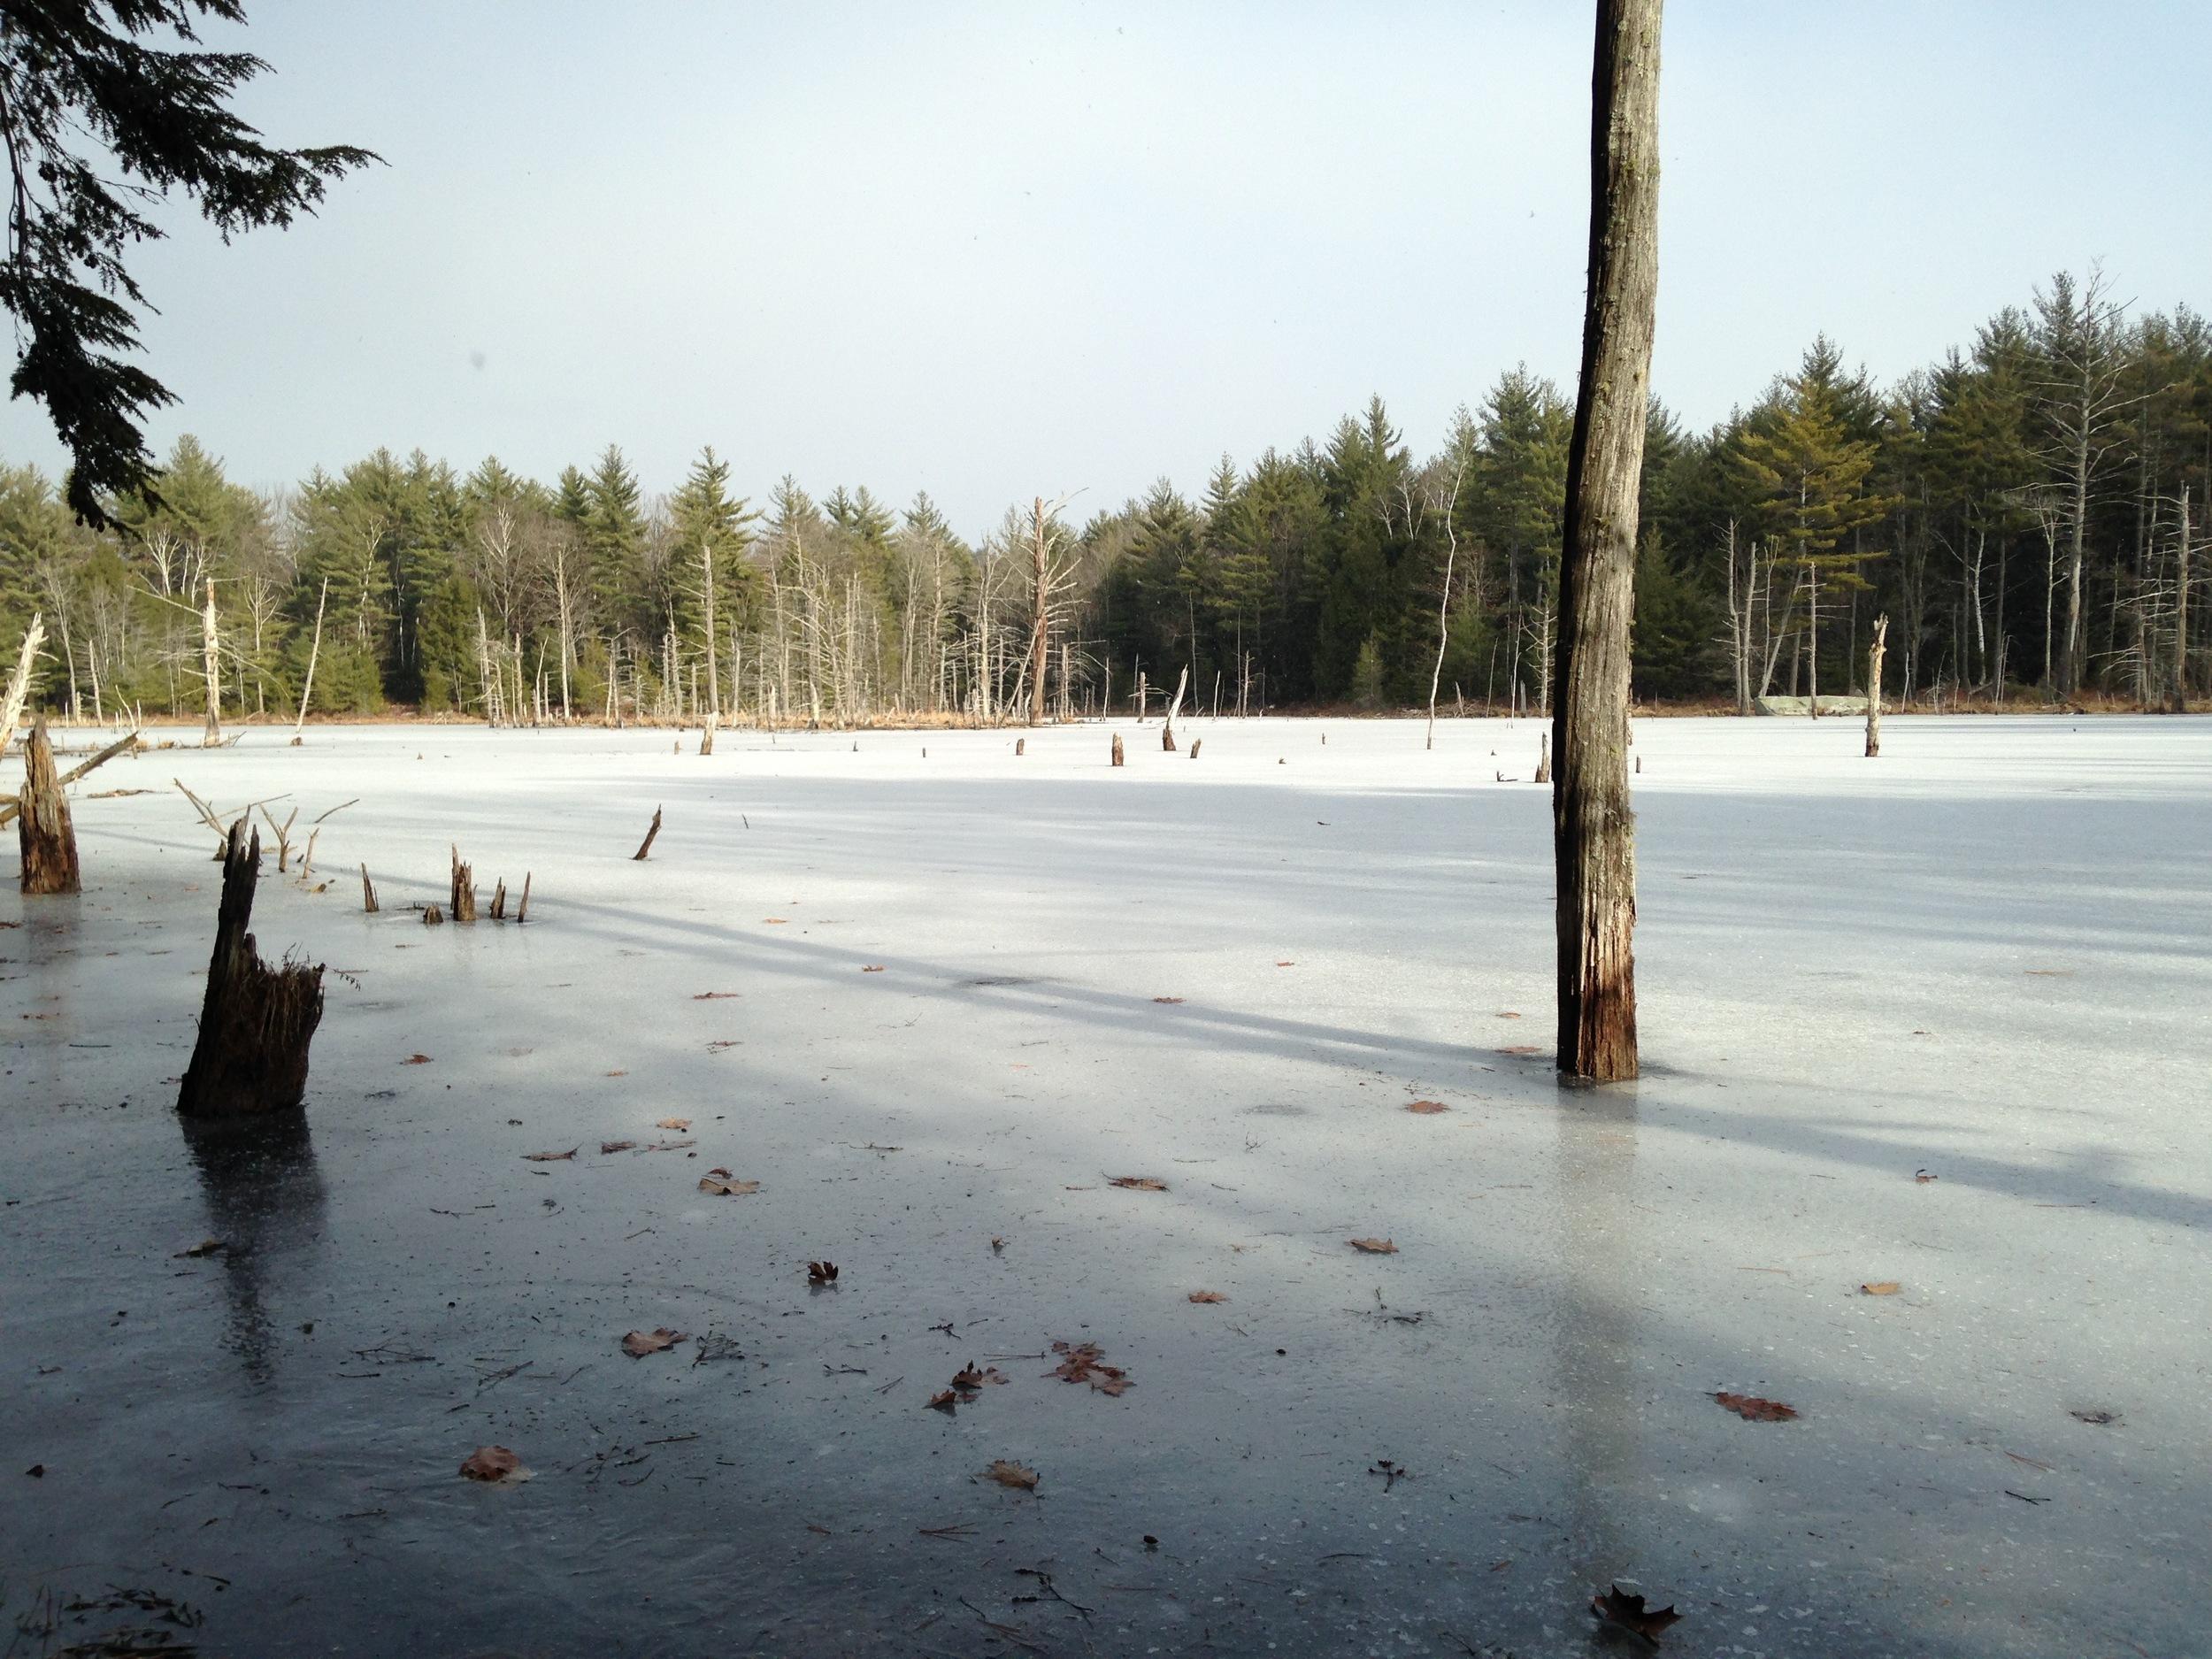 Beaver pond in winter